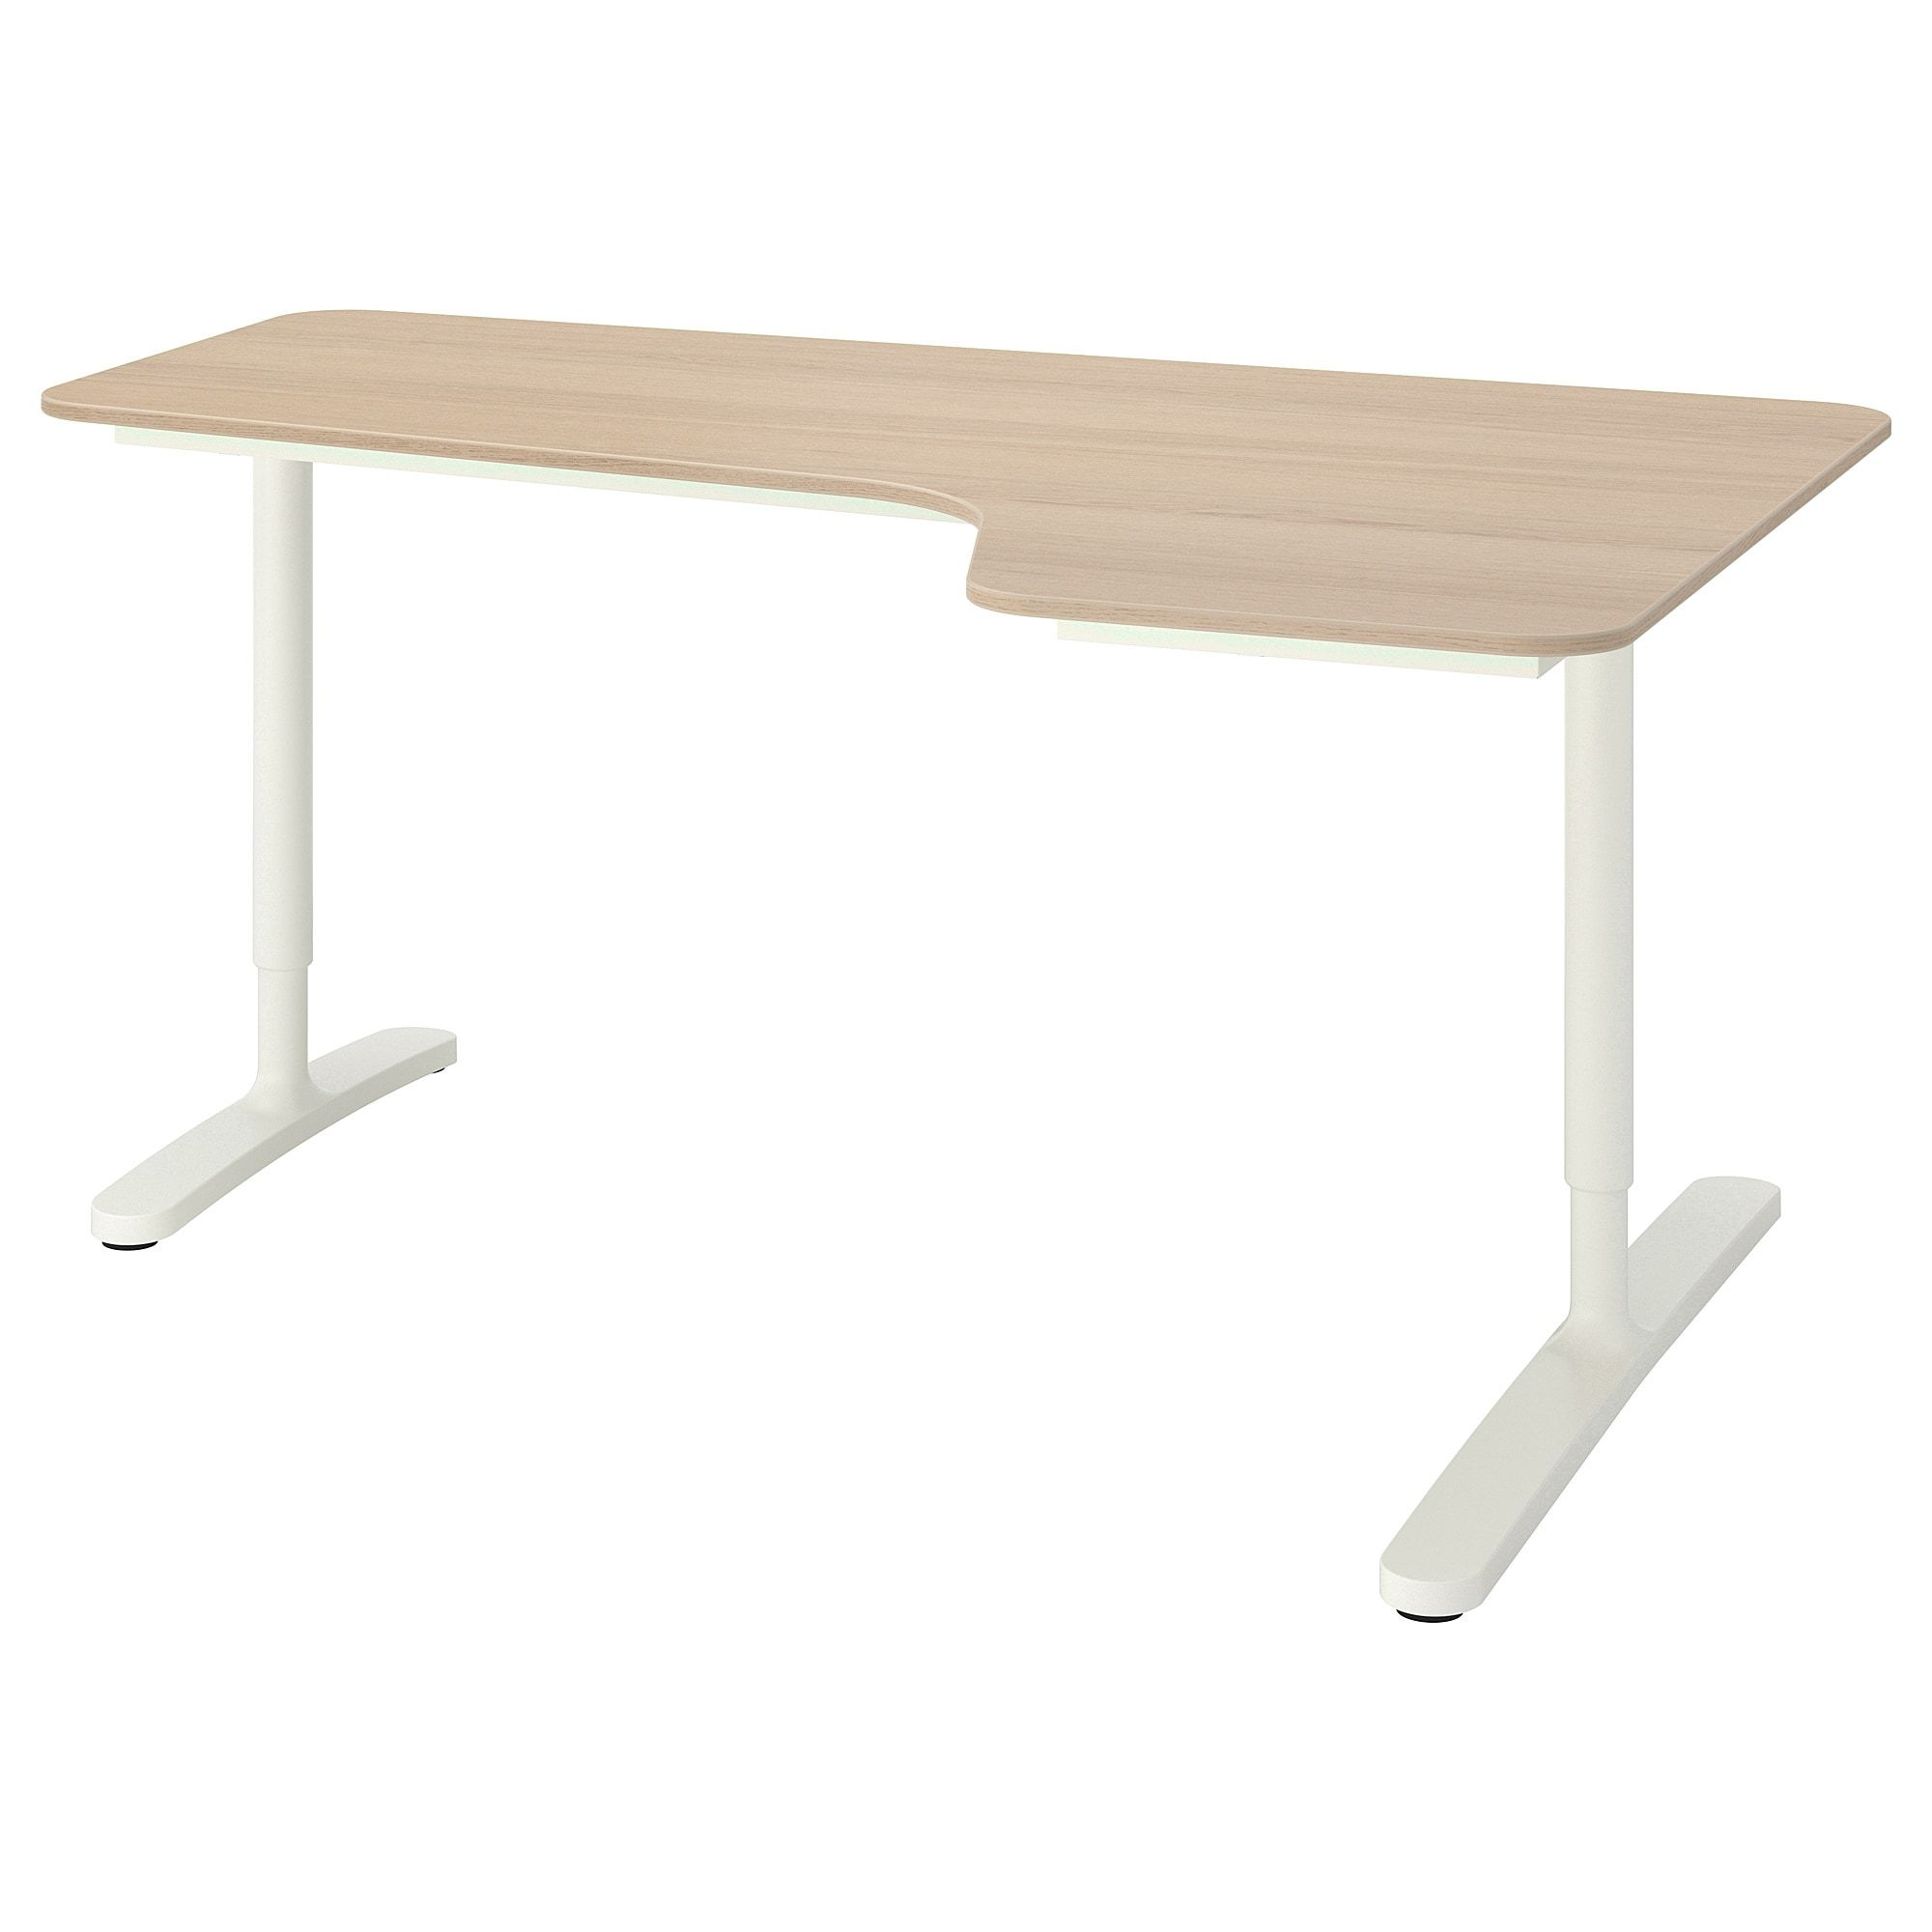 Ikea Bekant White Stained Oak Veneer White Corner Desk Right Ikea Ikea Bekant White Stain